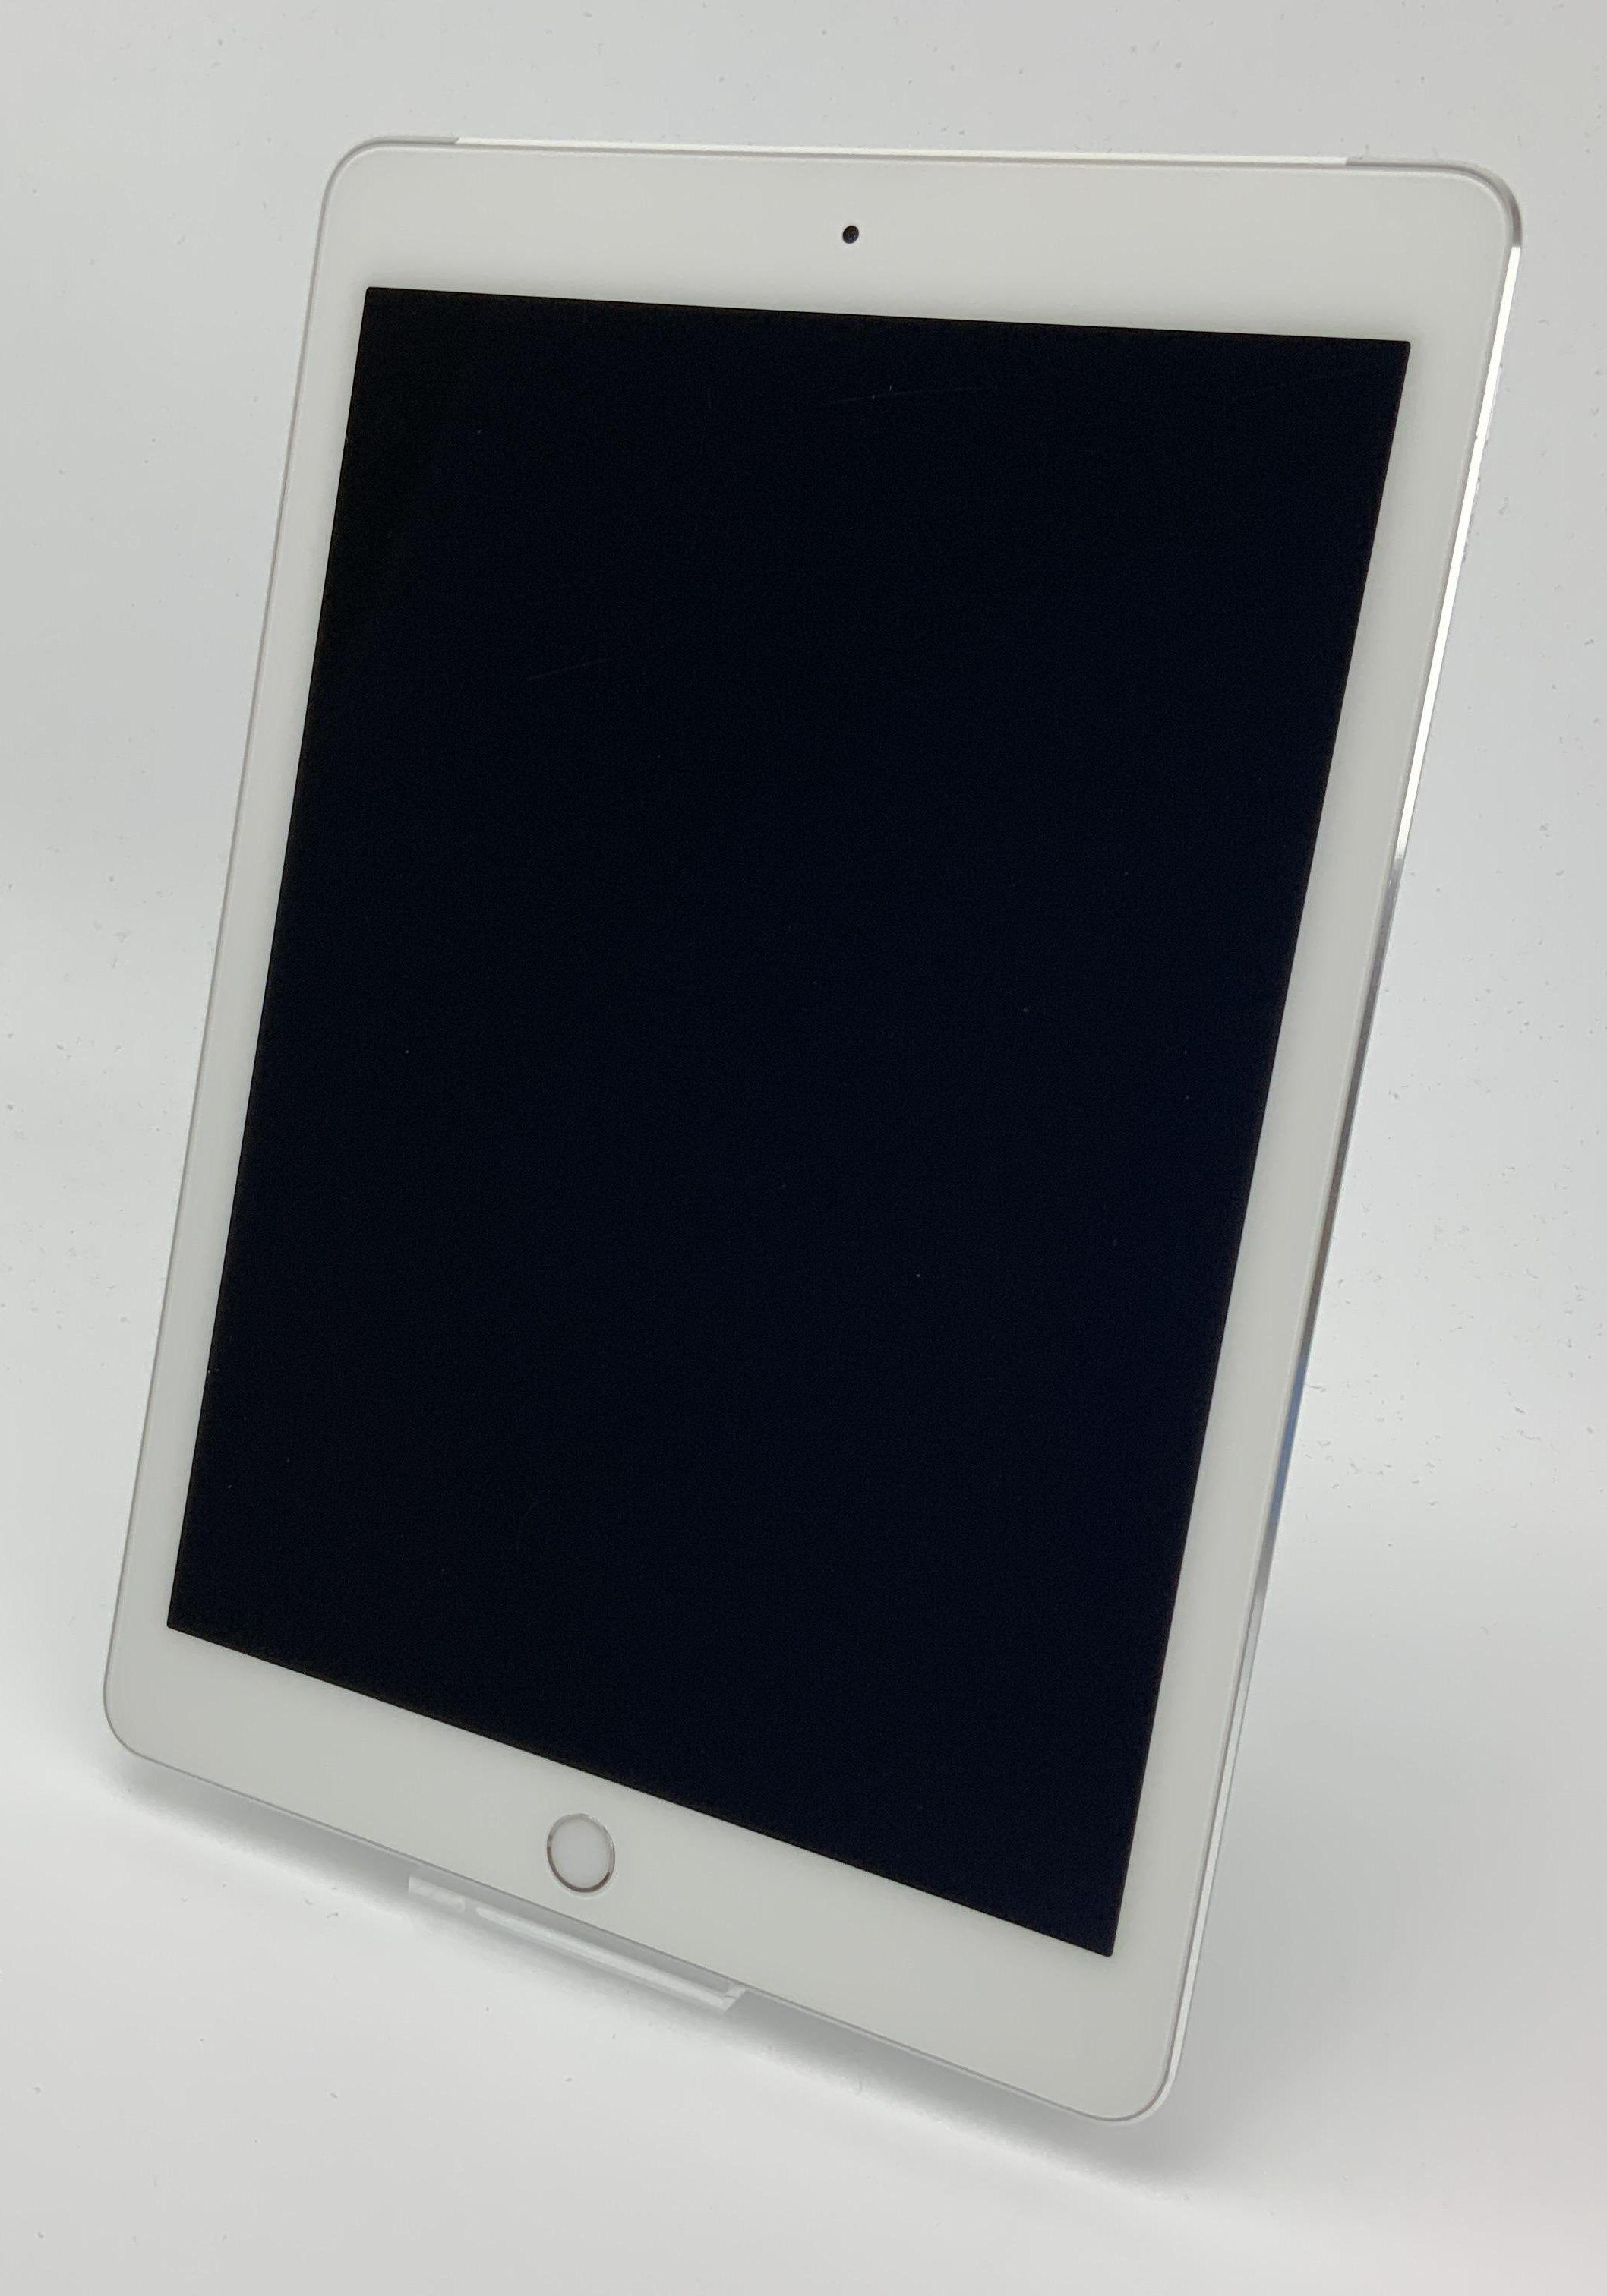 iPad Air 2 Wi-Fi + Cellular 16GB, 16GB, Silver, obraz 1